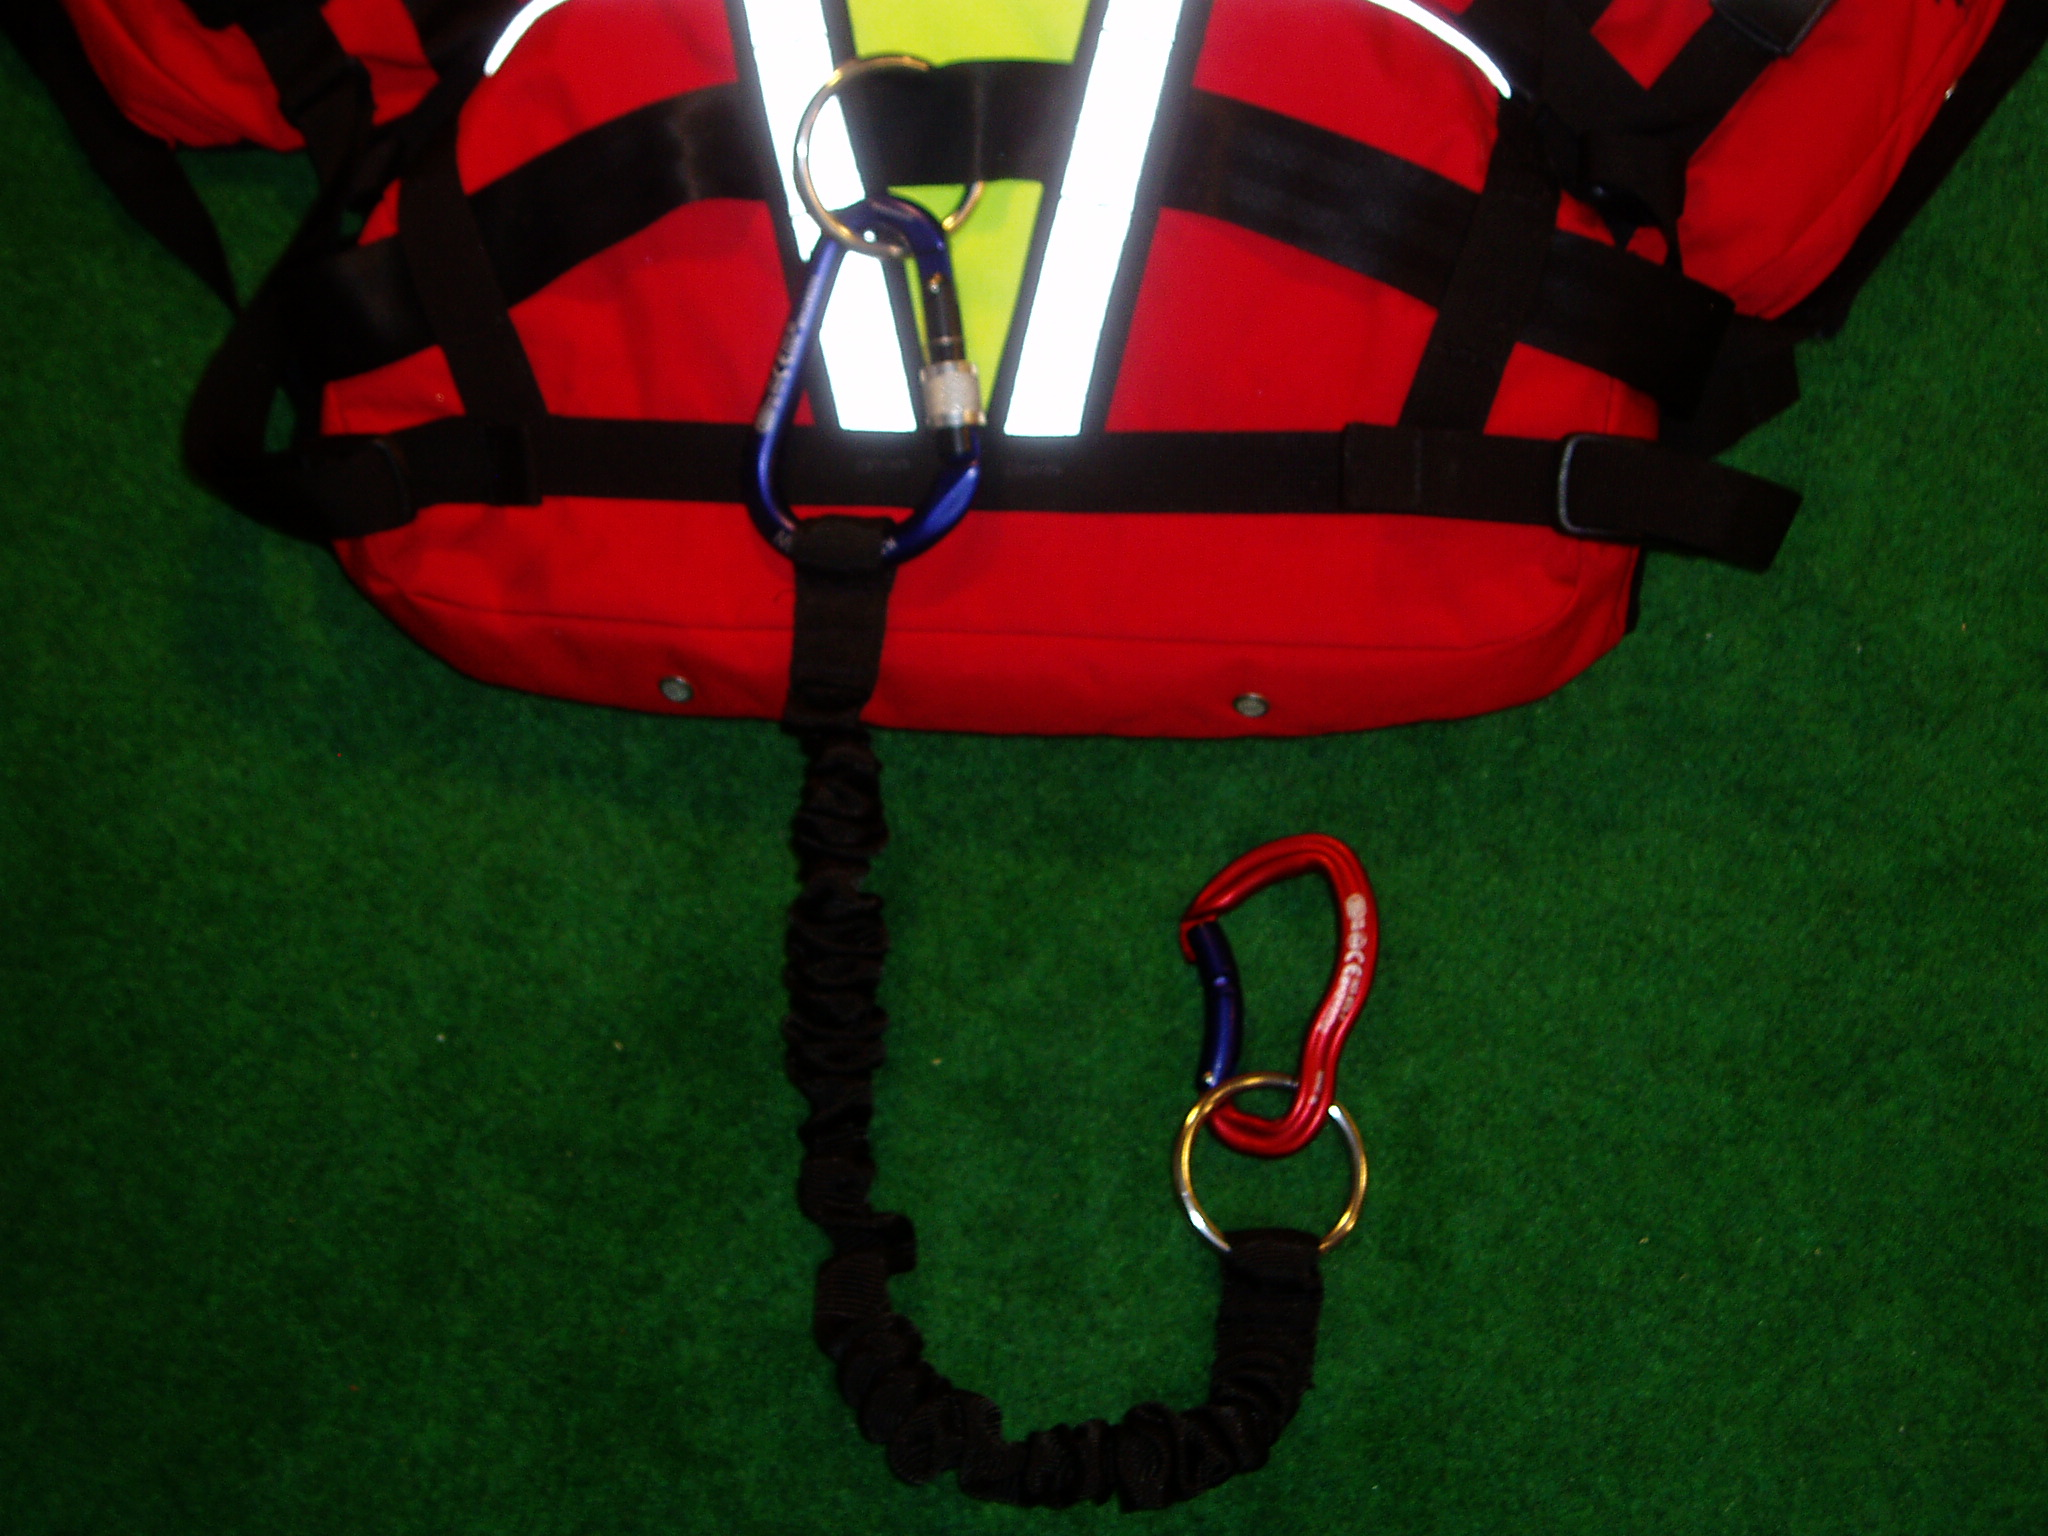 Klettergurt Brustgurt Anlegen : Brustgurt kanusport u2013 wikipedia